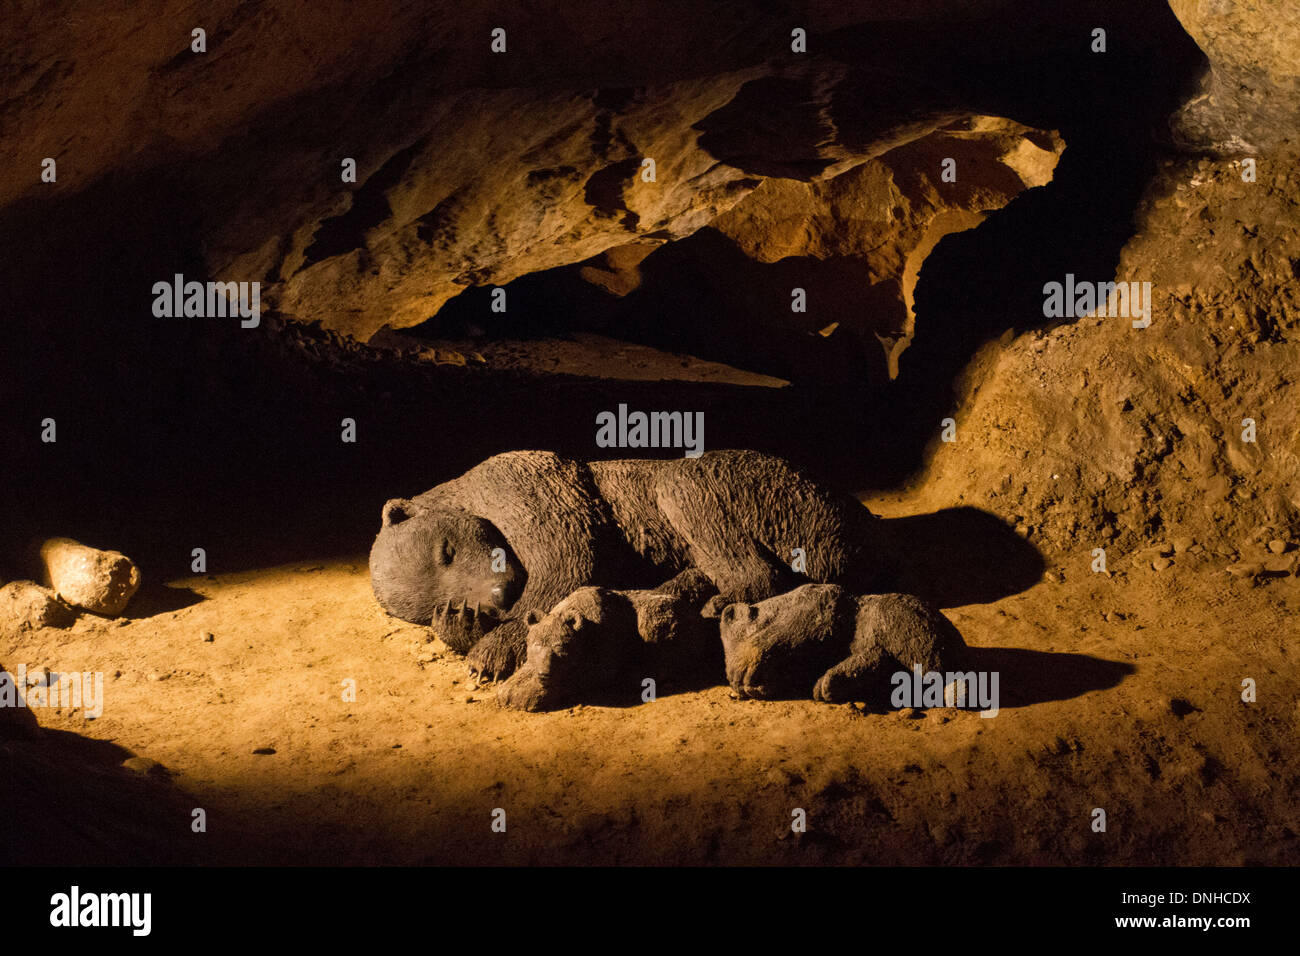 Bears hibernating in Arrikrutz caves, Oñati, Basque Country - Stock Image